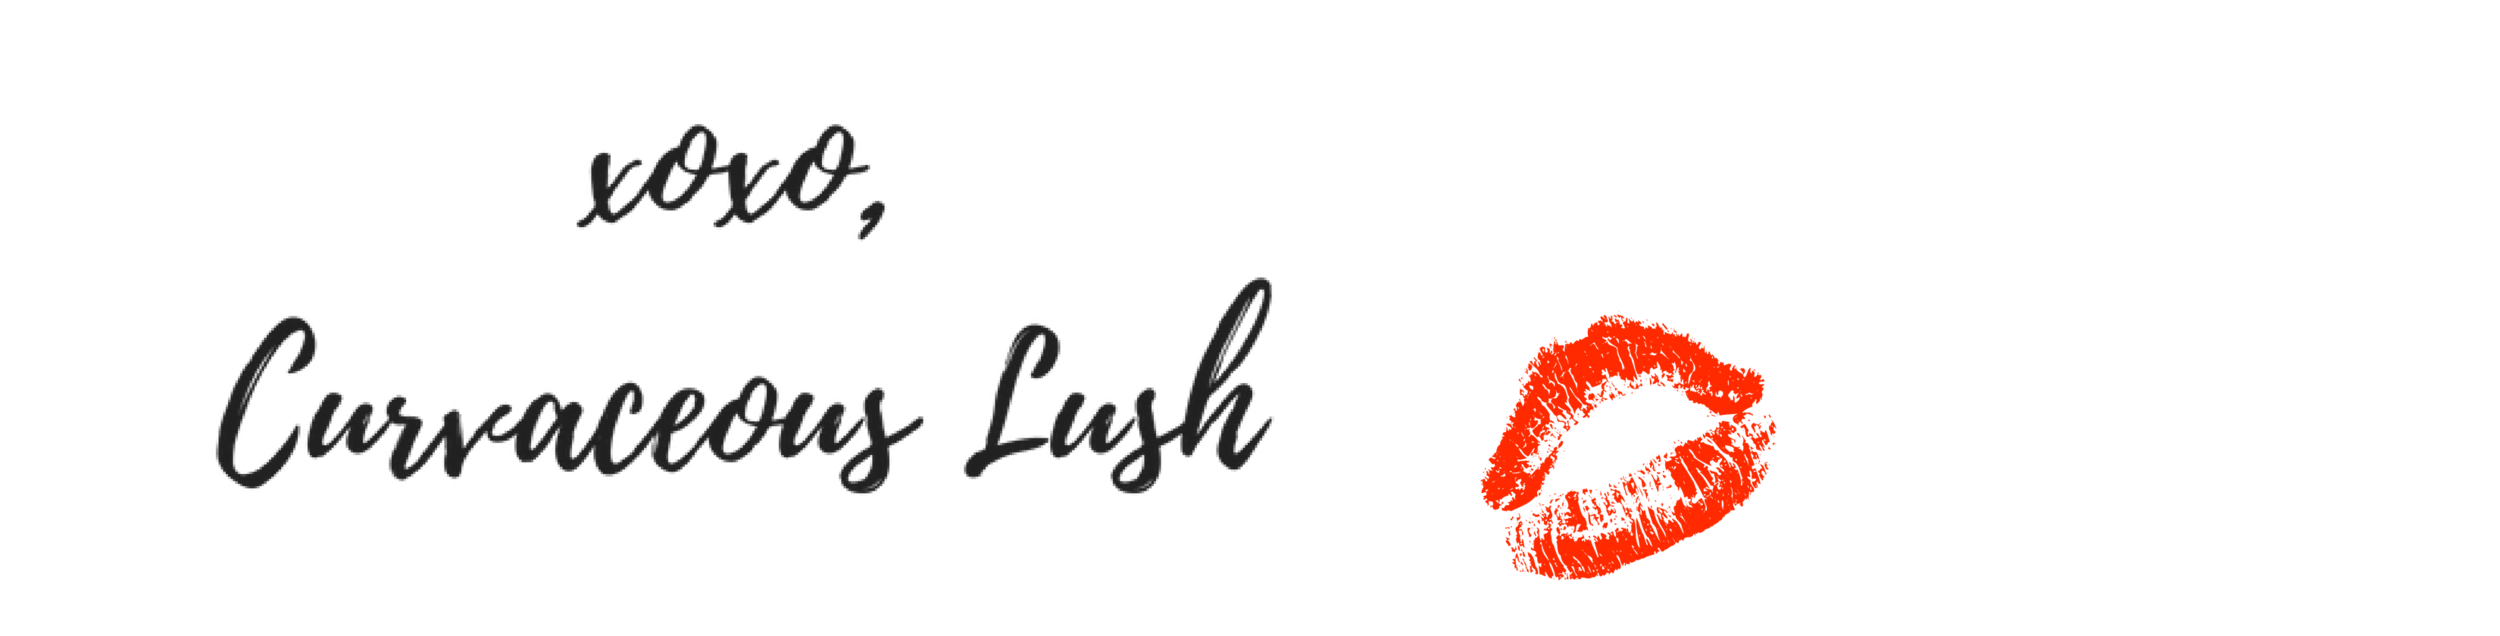 Curvaceous Lush Signature